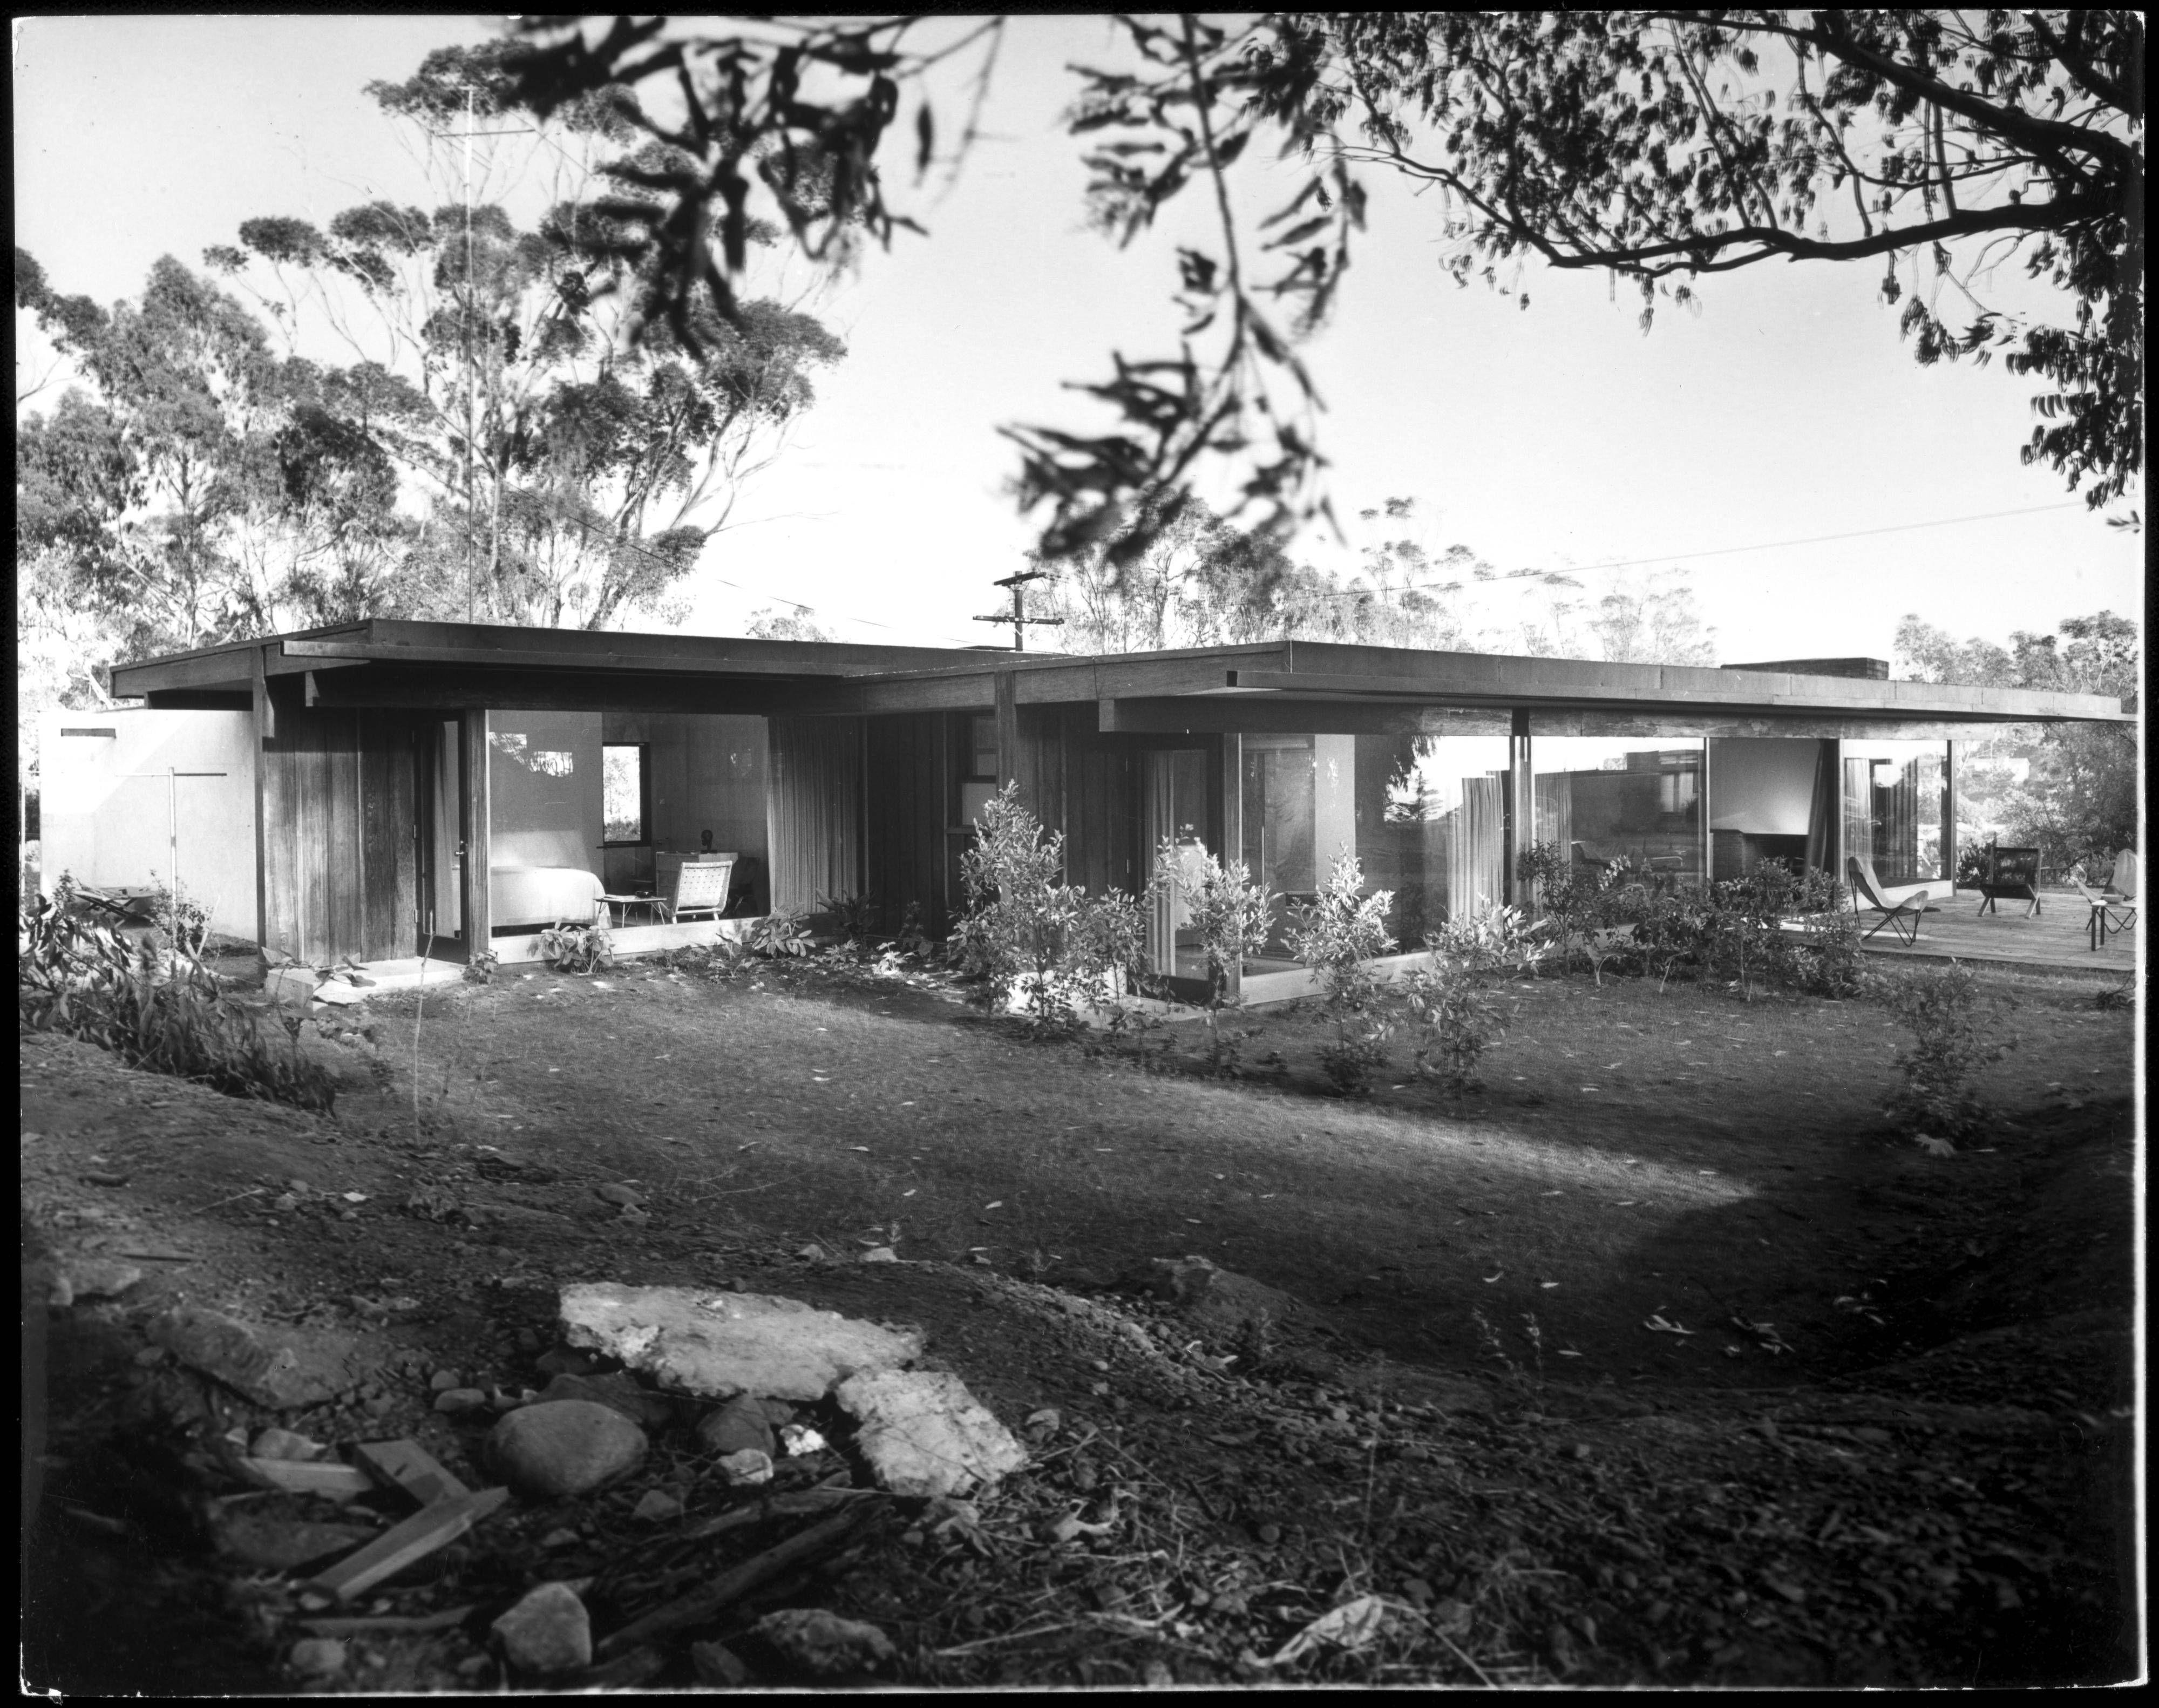 Case Study House #20: The Richard Neutra Baily House.